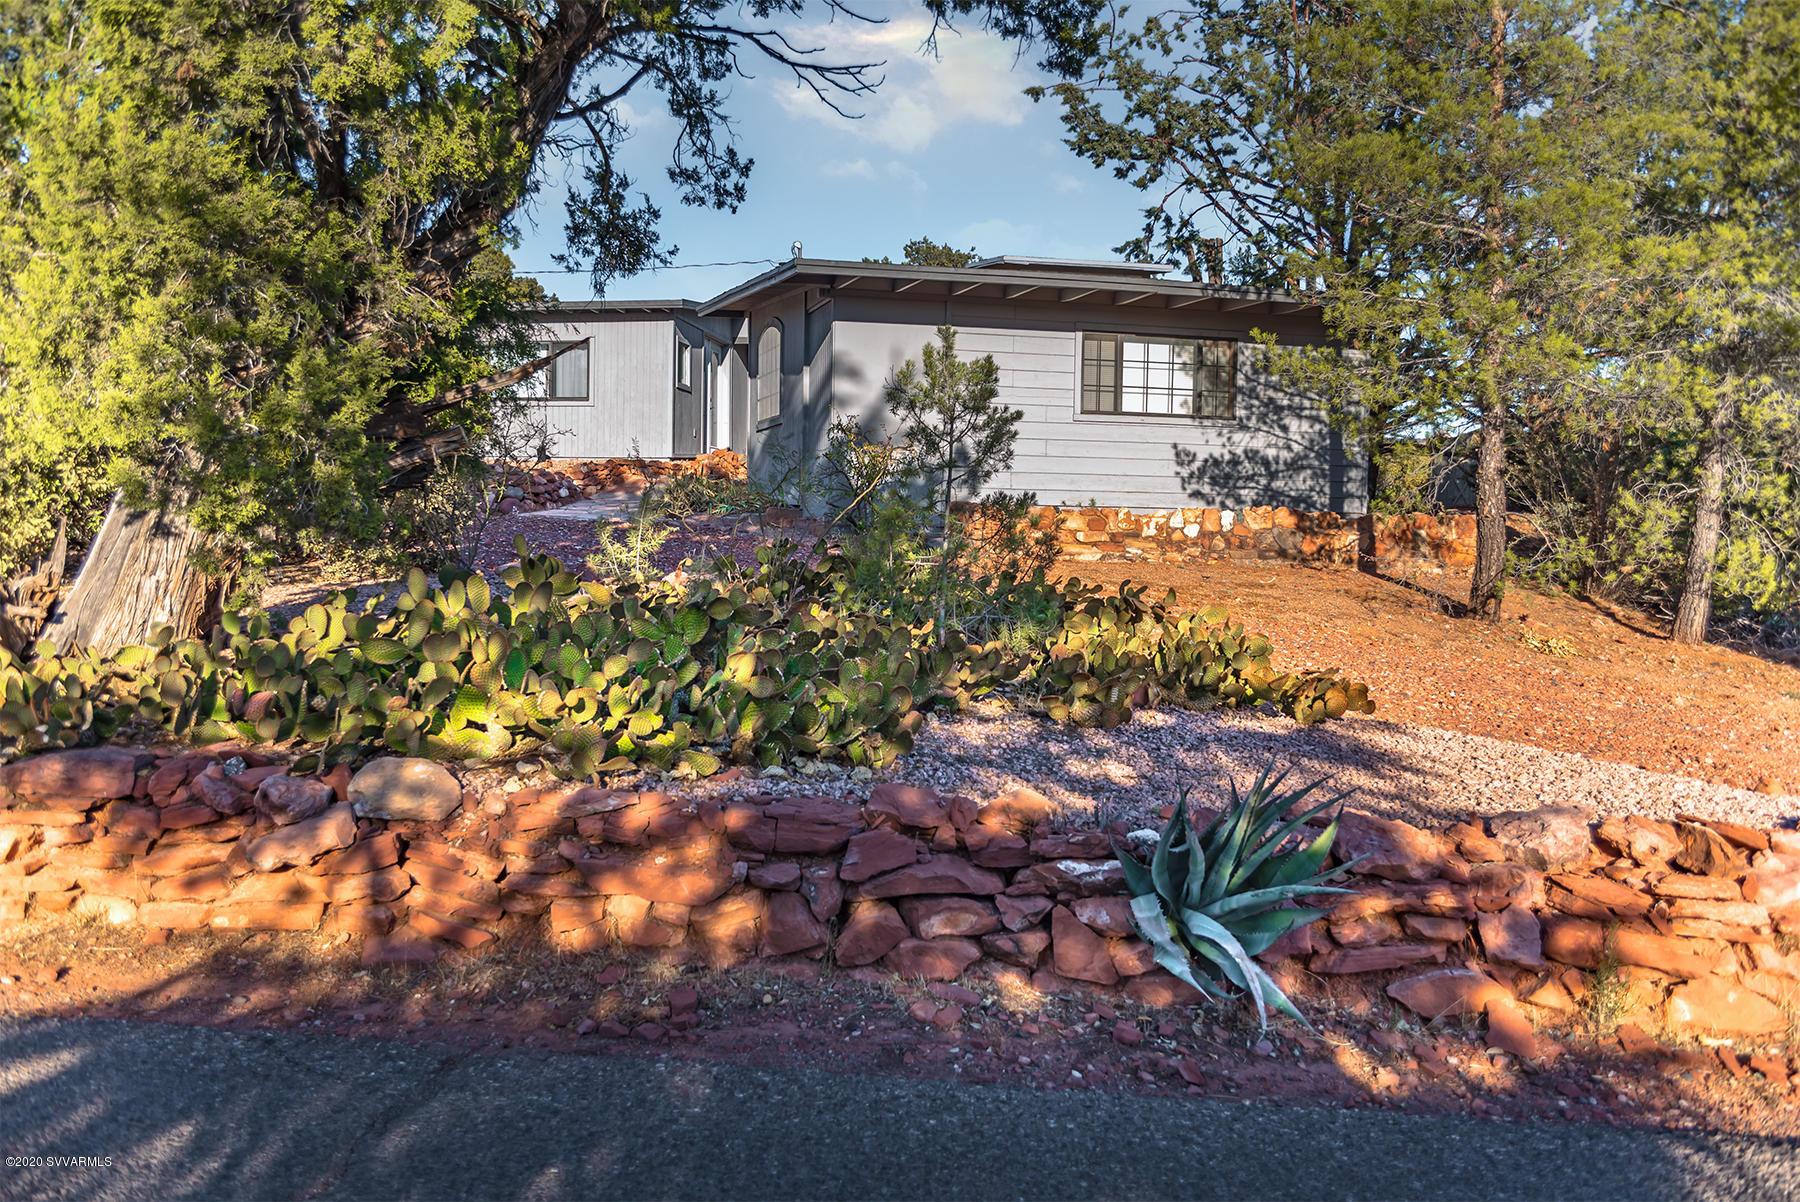 170 Goodrow Lane Sedona, AZ 86336